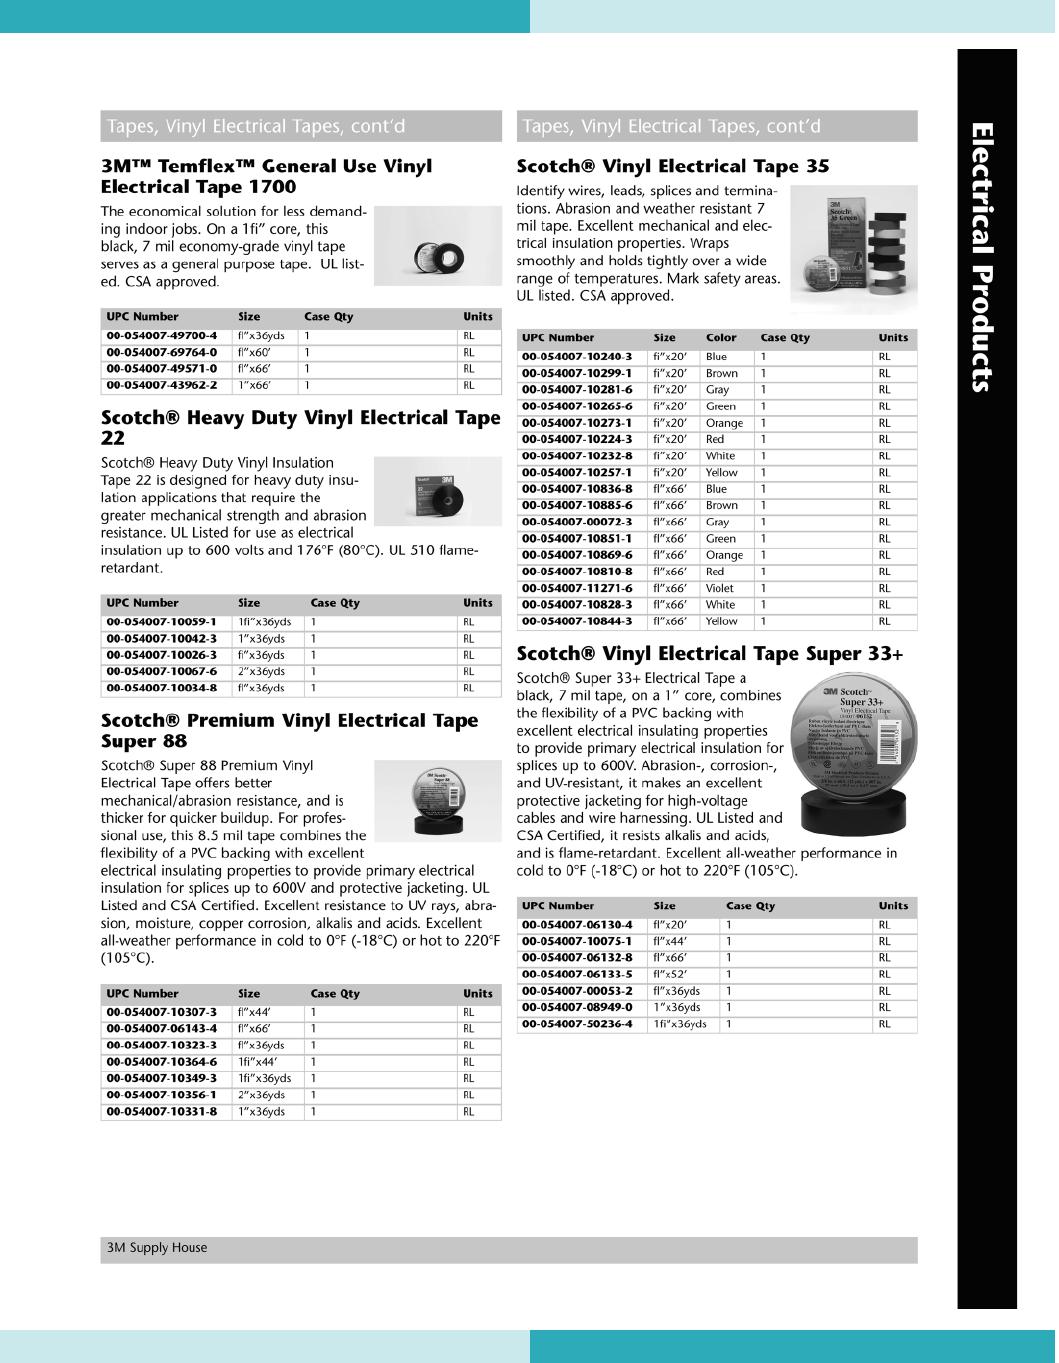 Vintage Parts 555371 1 Nice 81 White Stamped Aluminum European License Plate